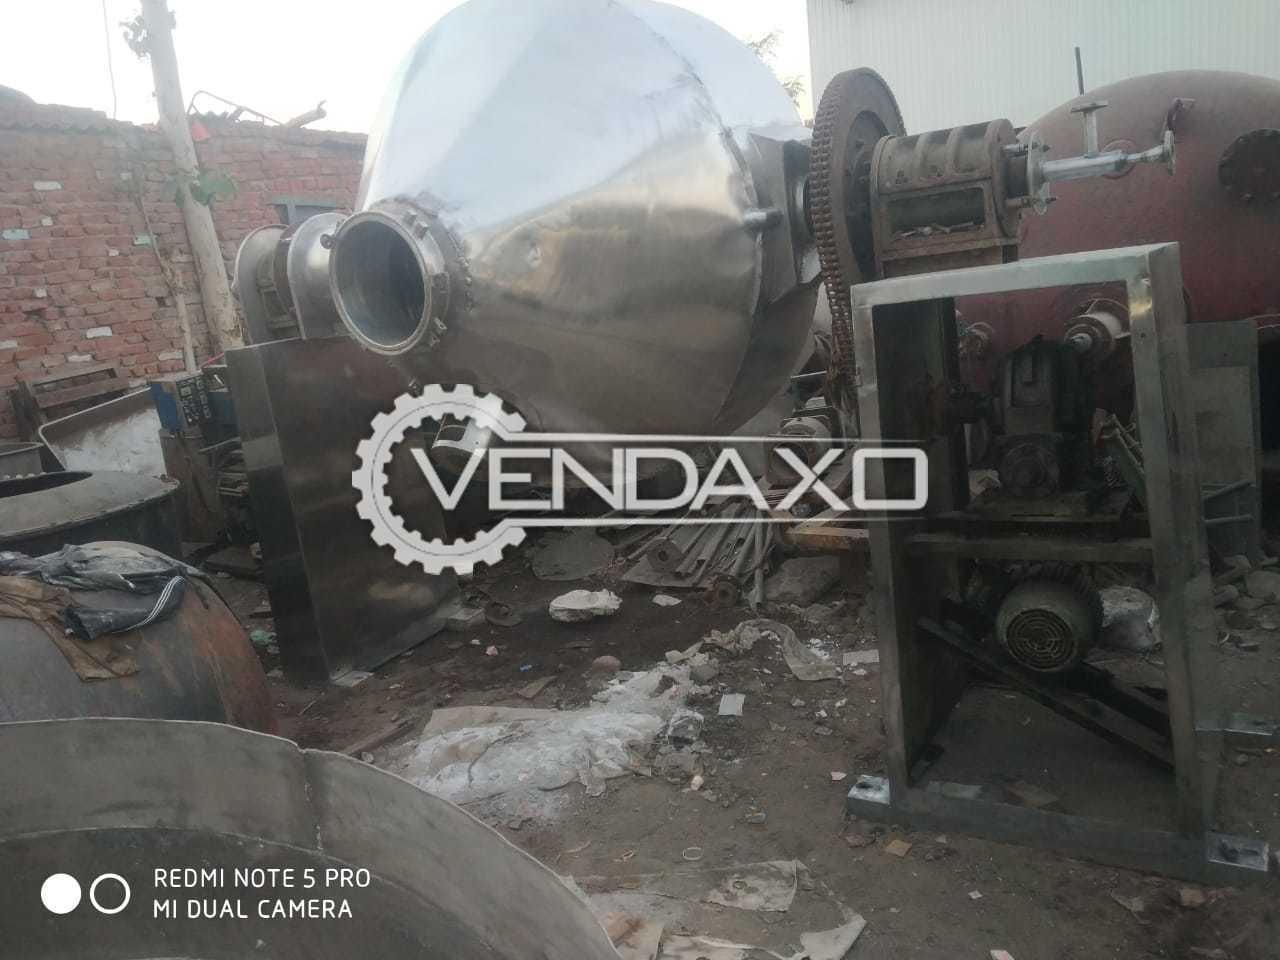 SS 316 Double Roto Cone Vacuum Dryer (RCVD) - 2500 Liter